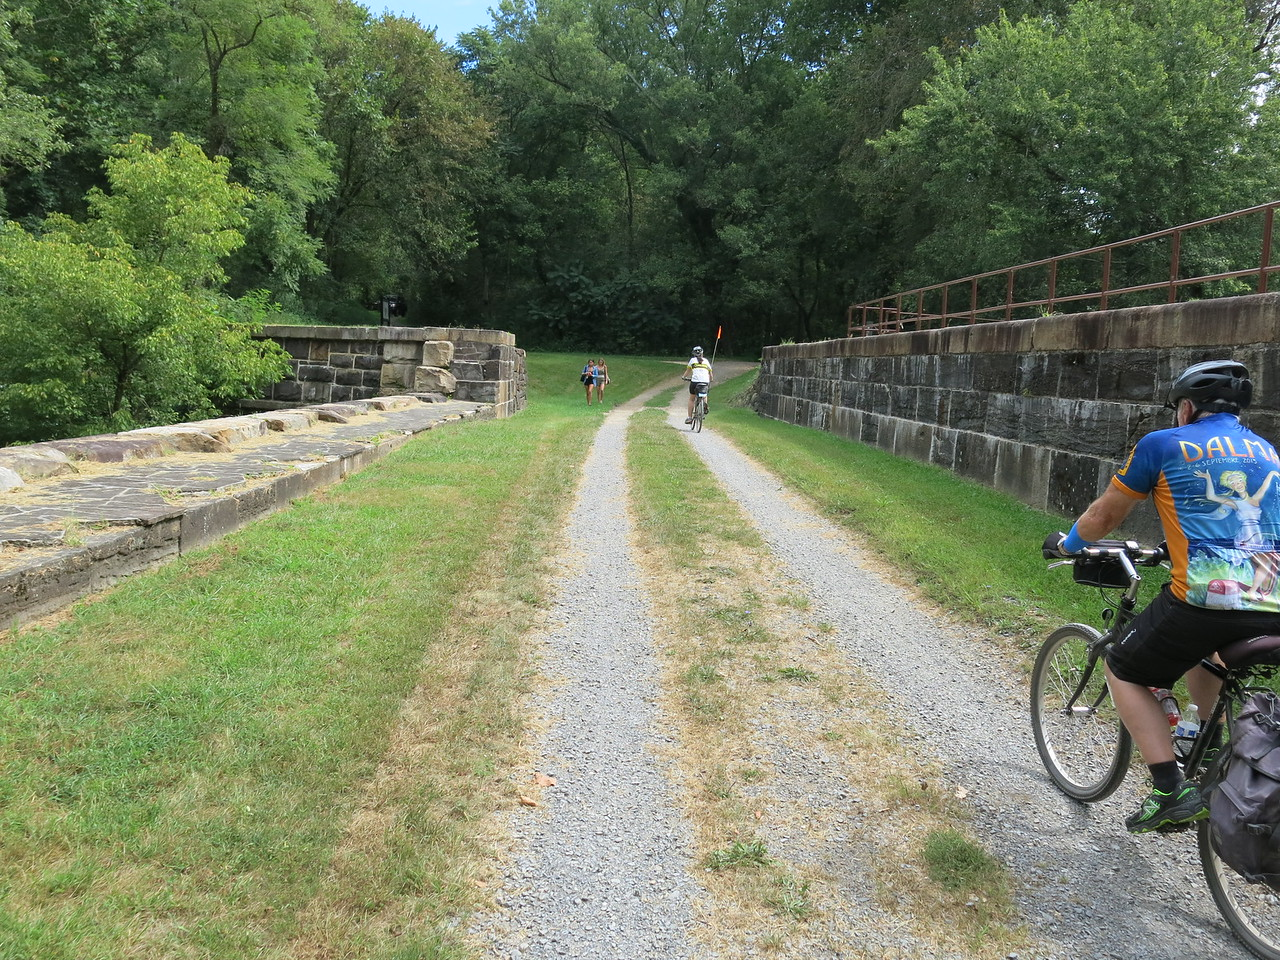 Town Creek Aqueduct at MP 162